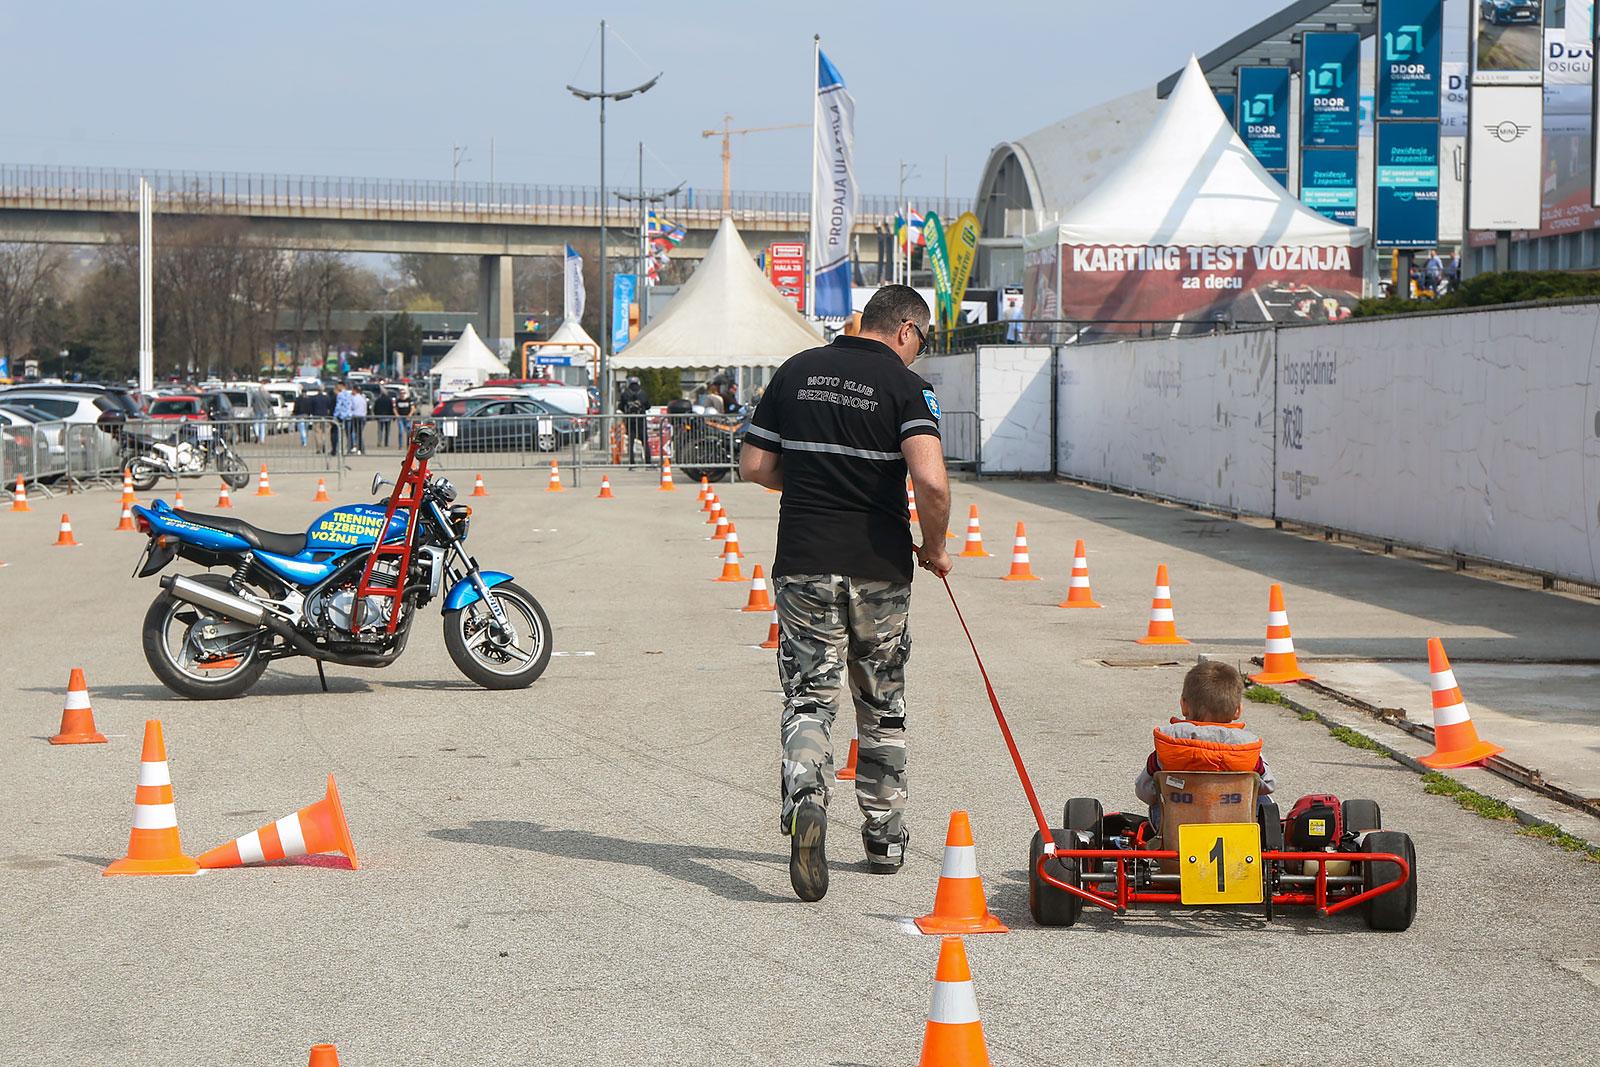 Treninzi bezbedne vožnje Sportskog udruženja Moto klub Bezbednost